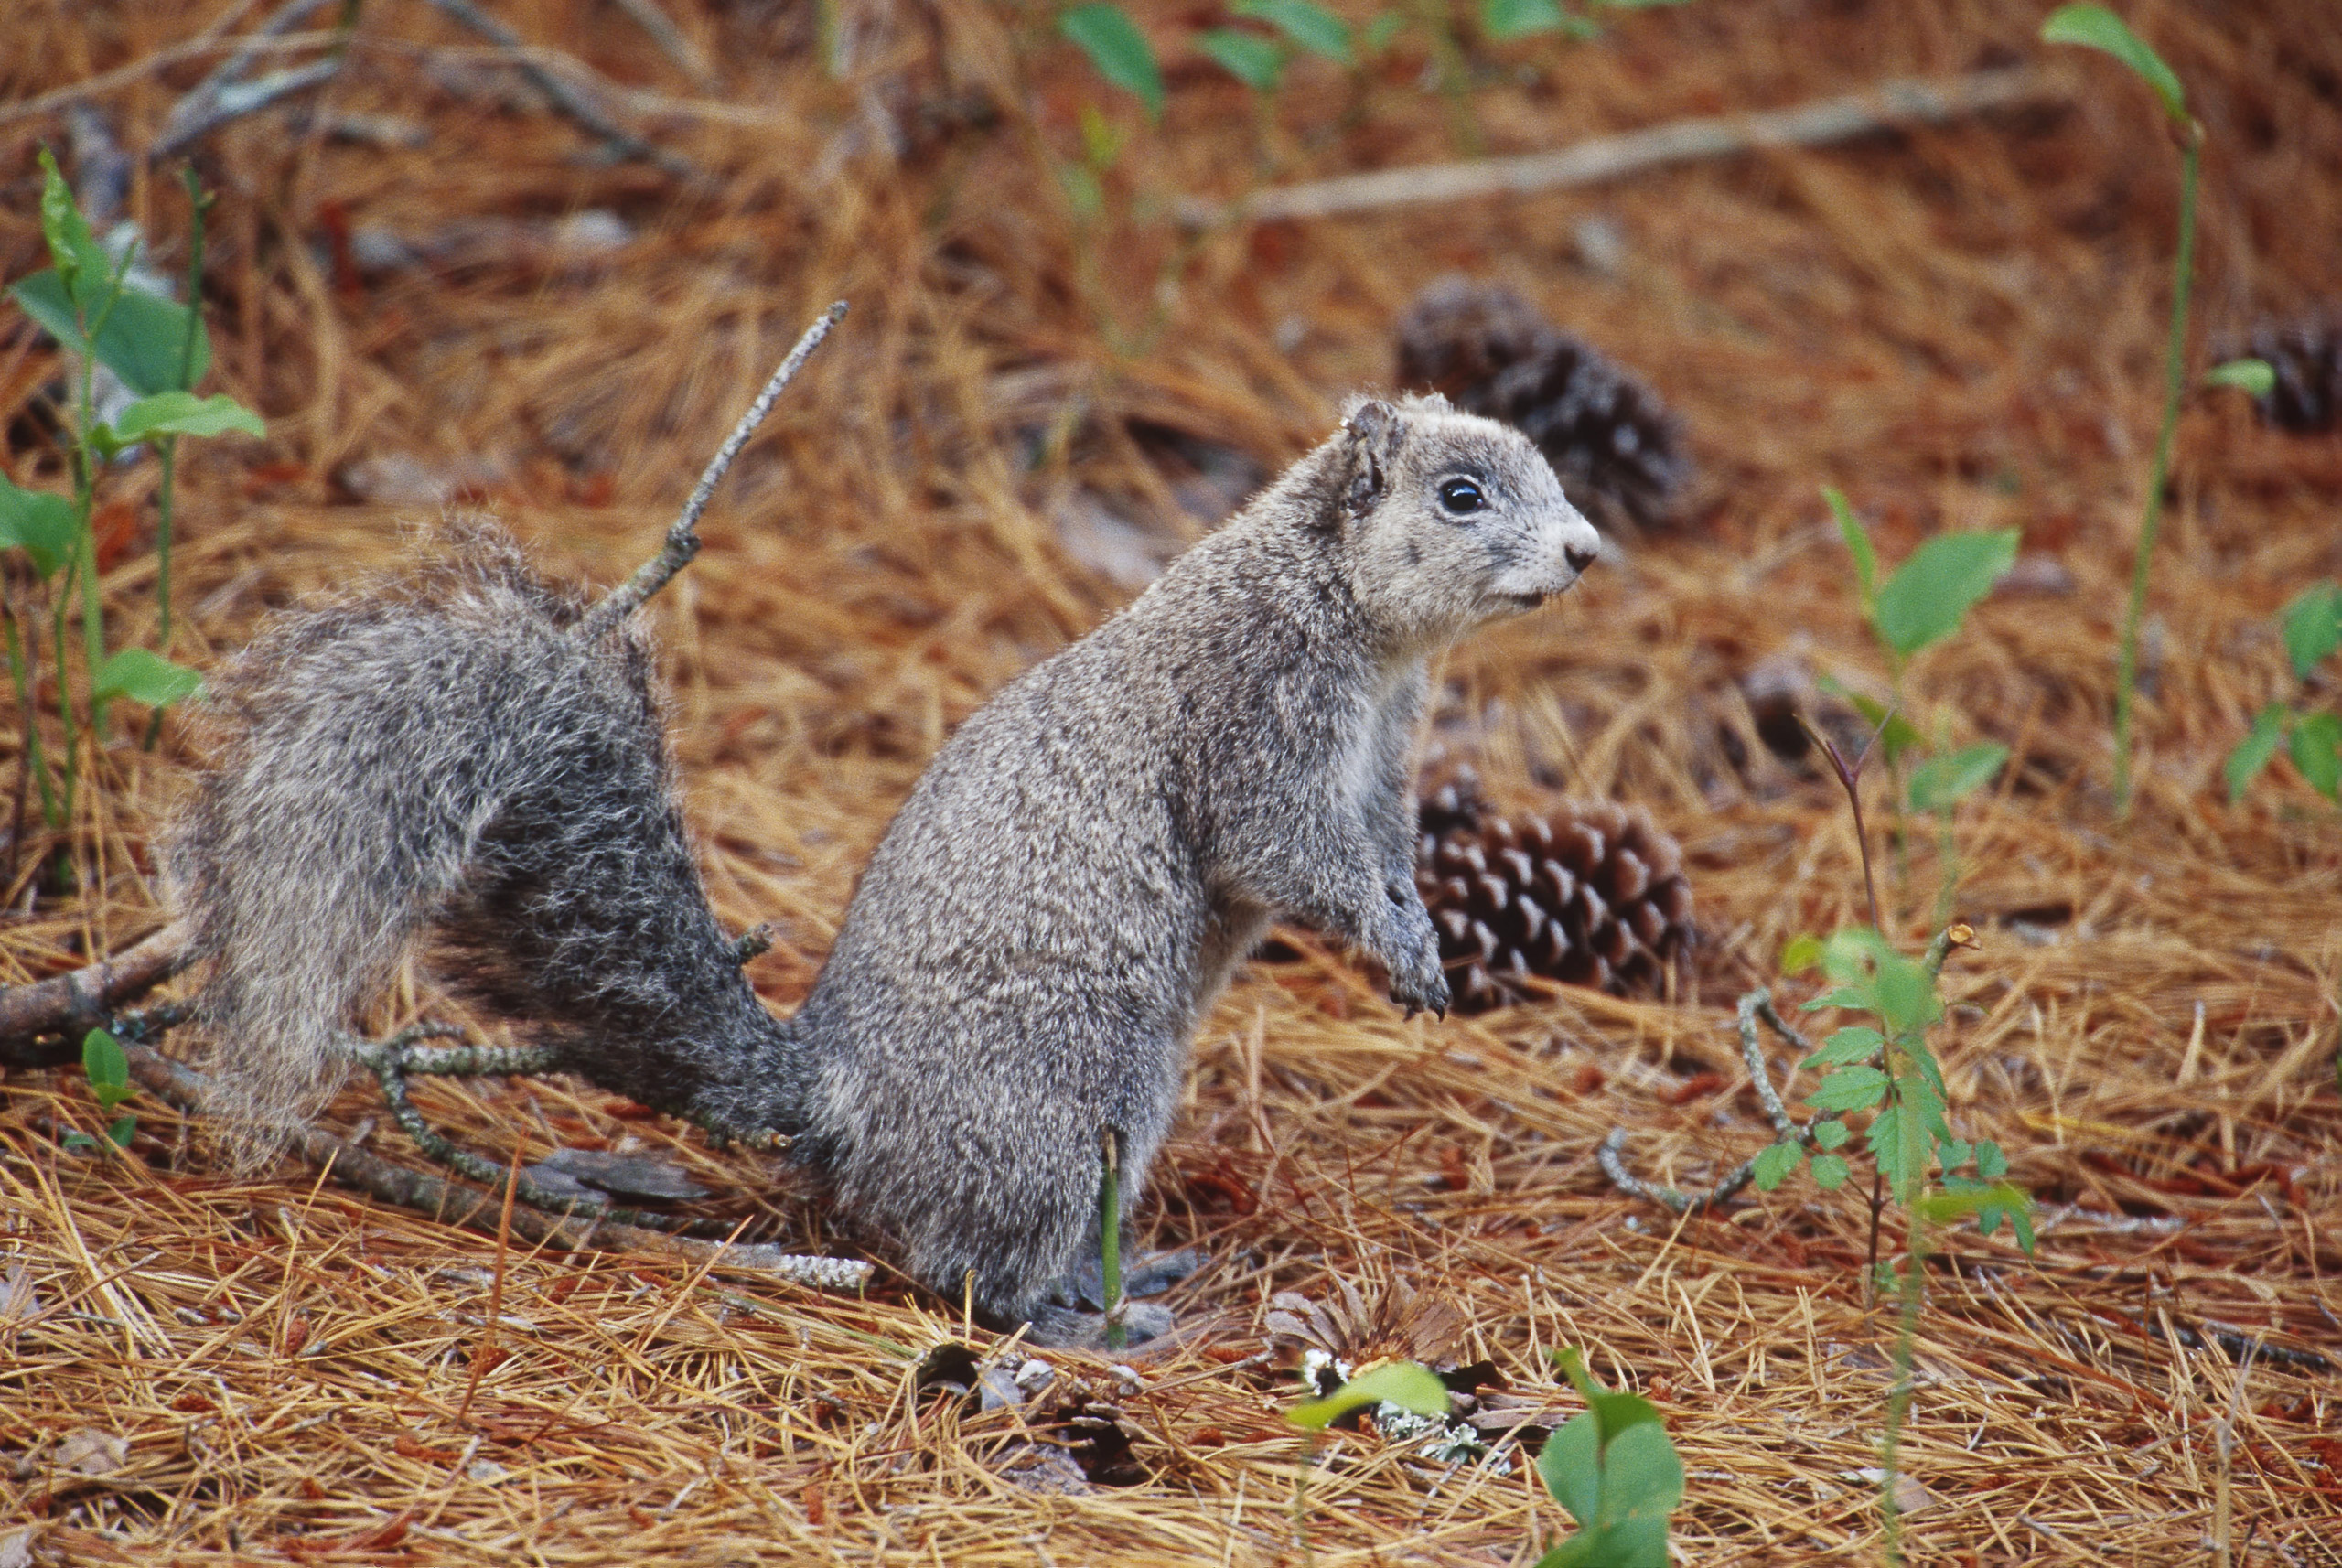 Delmarva Peninsula Fox Squirrel, <i>Sciurus niger cinereus.</i>Status: Delisted due to recovery, in 2015.